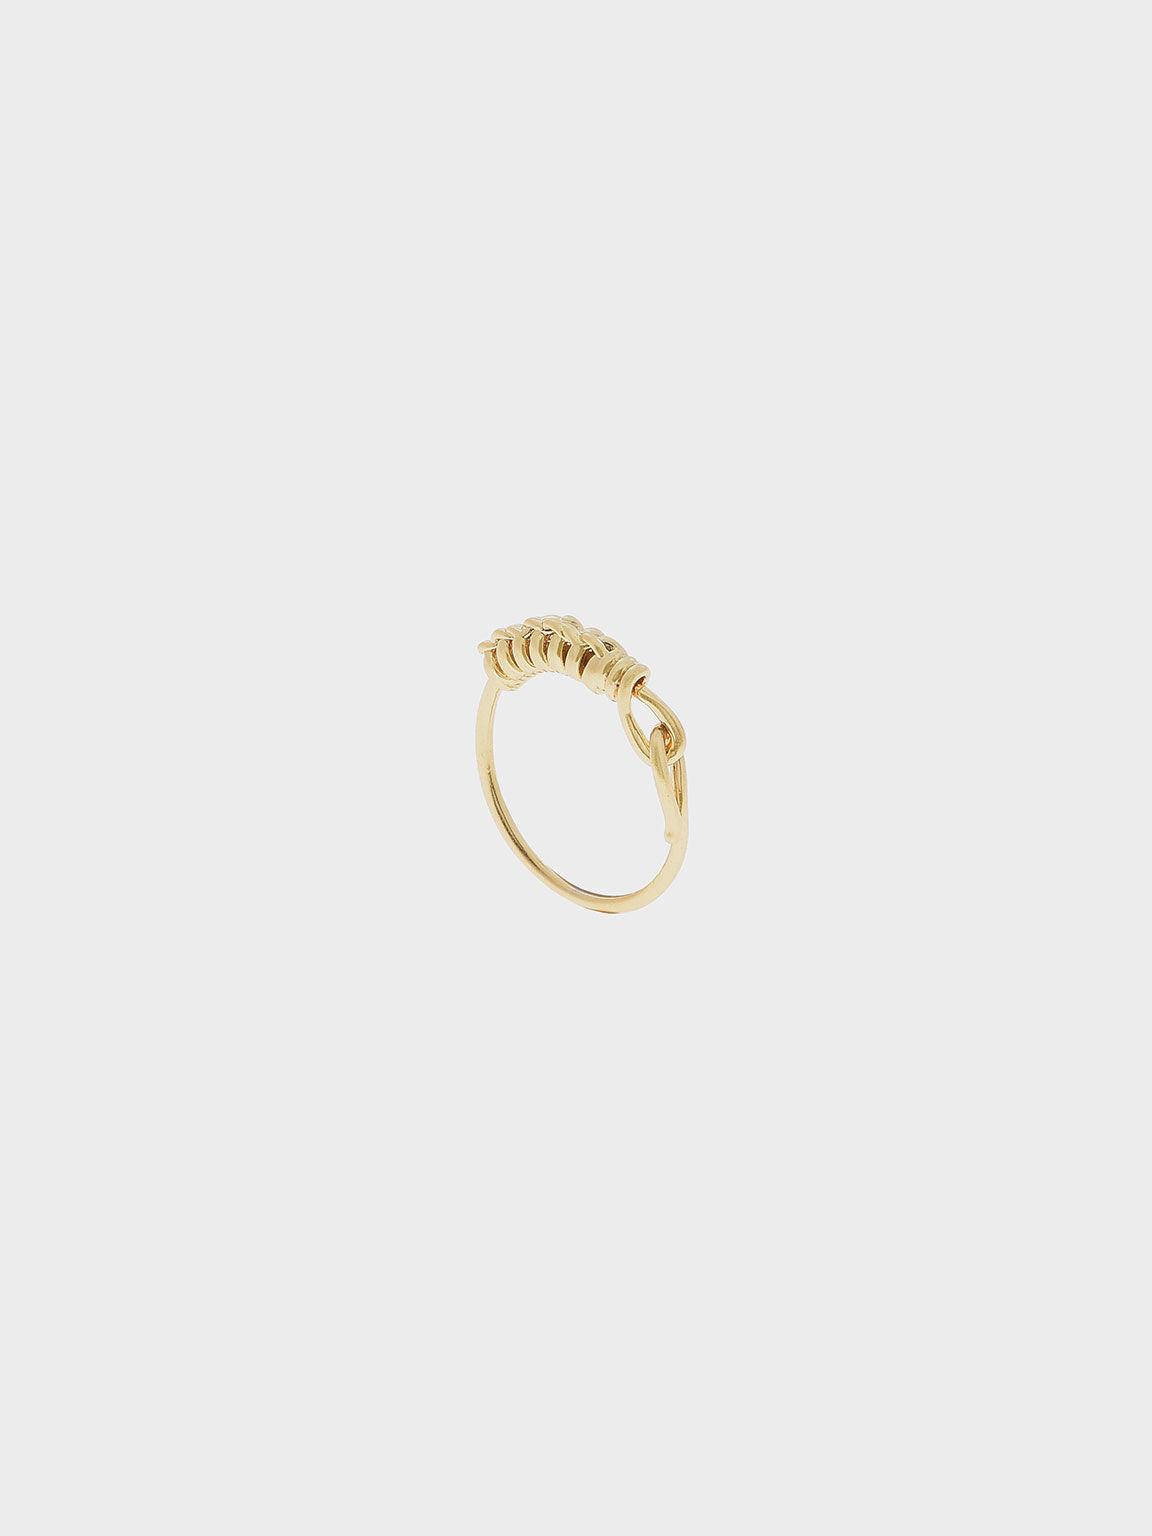 Twist Ring, Brush Gold, hi-res